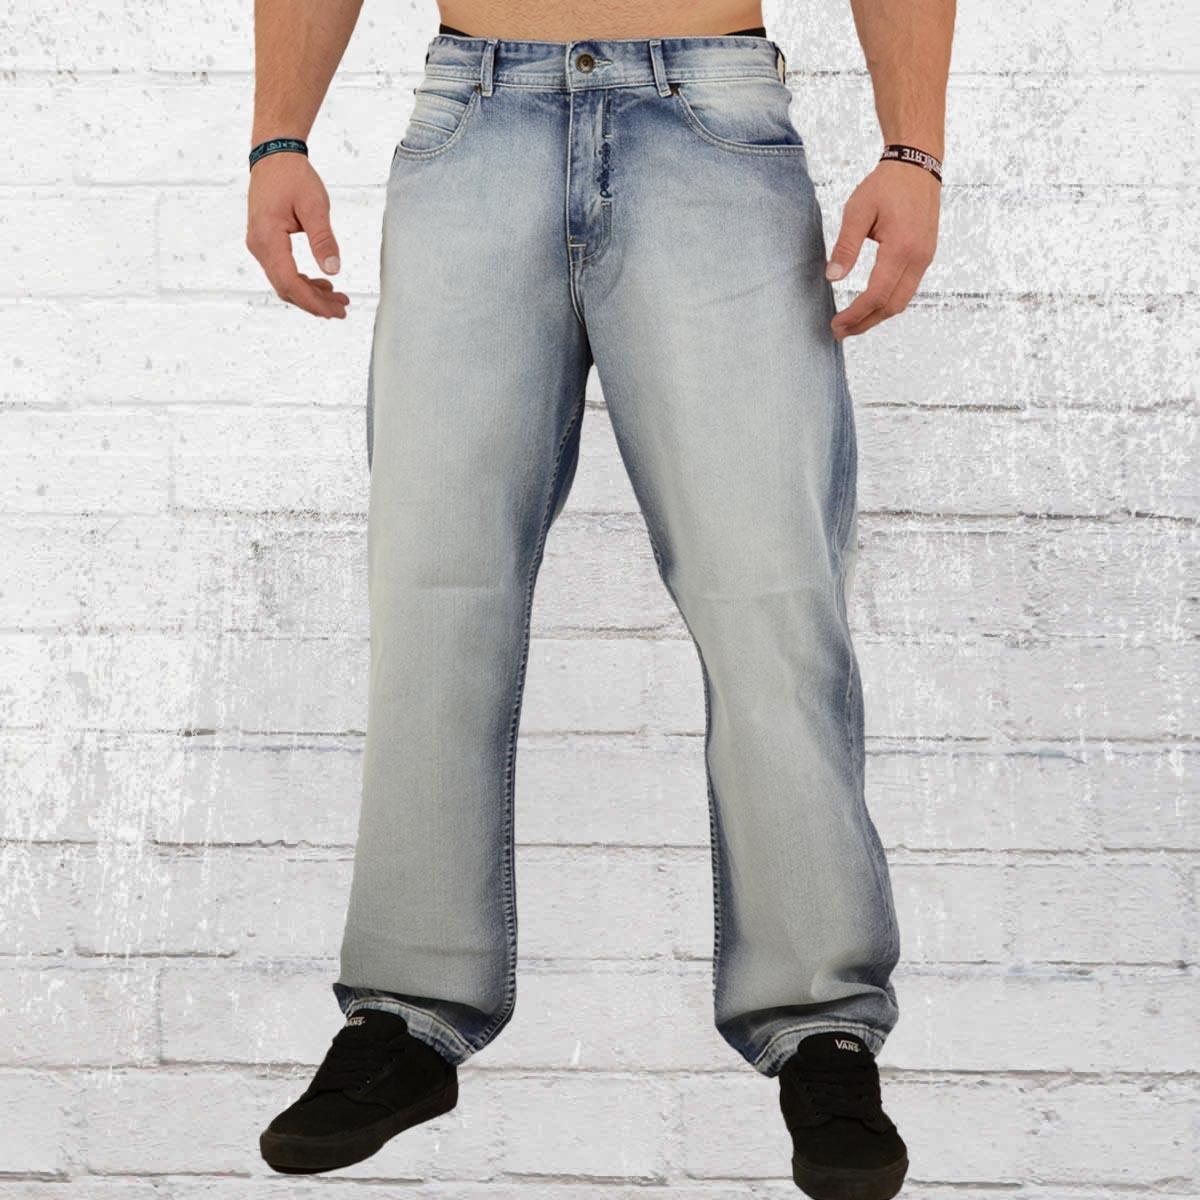 51ed5d25 Order now | Pelle Pelle Mens Jeans Baxter Baggy light blue wash